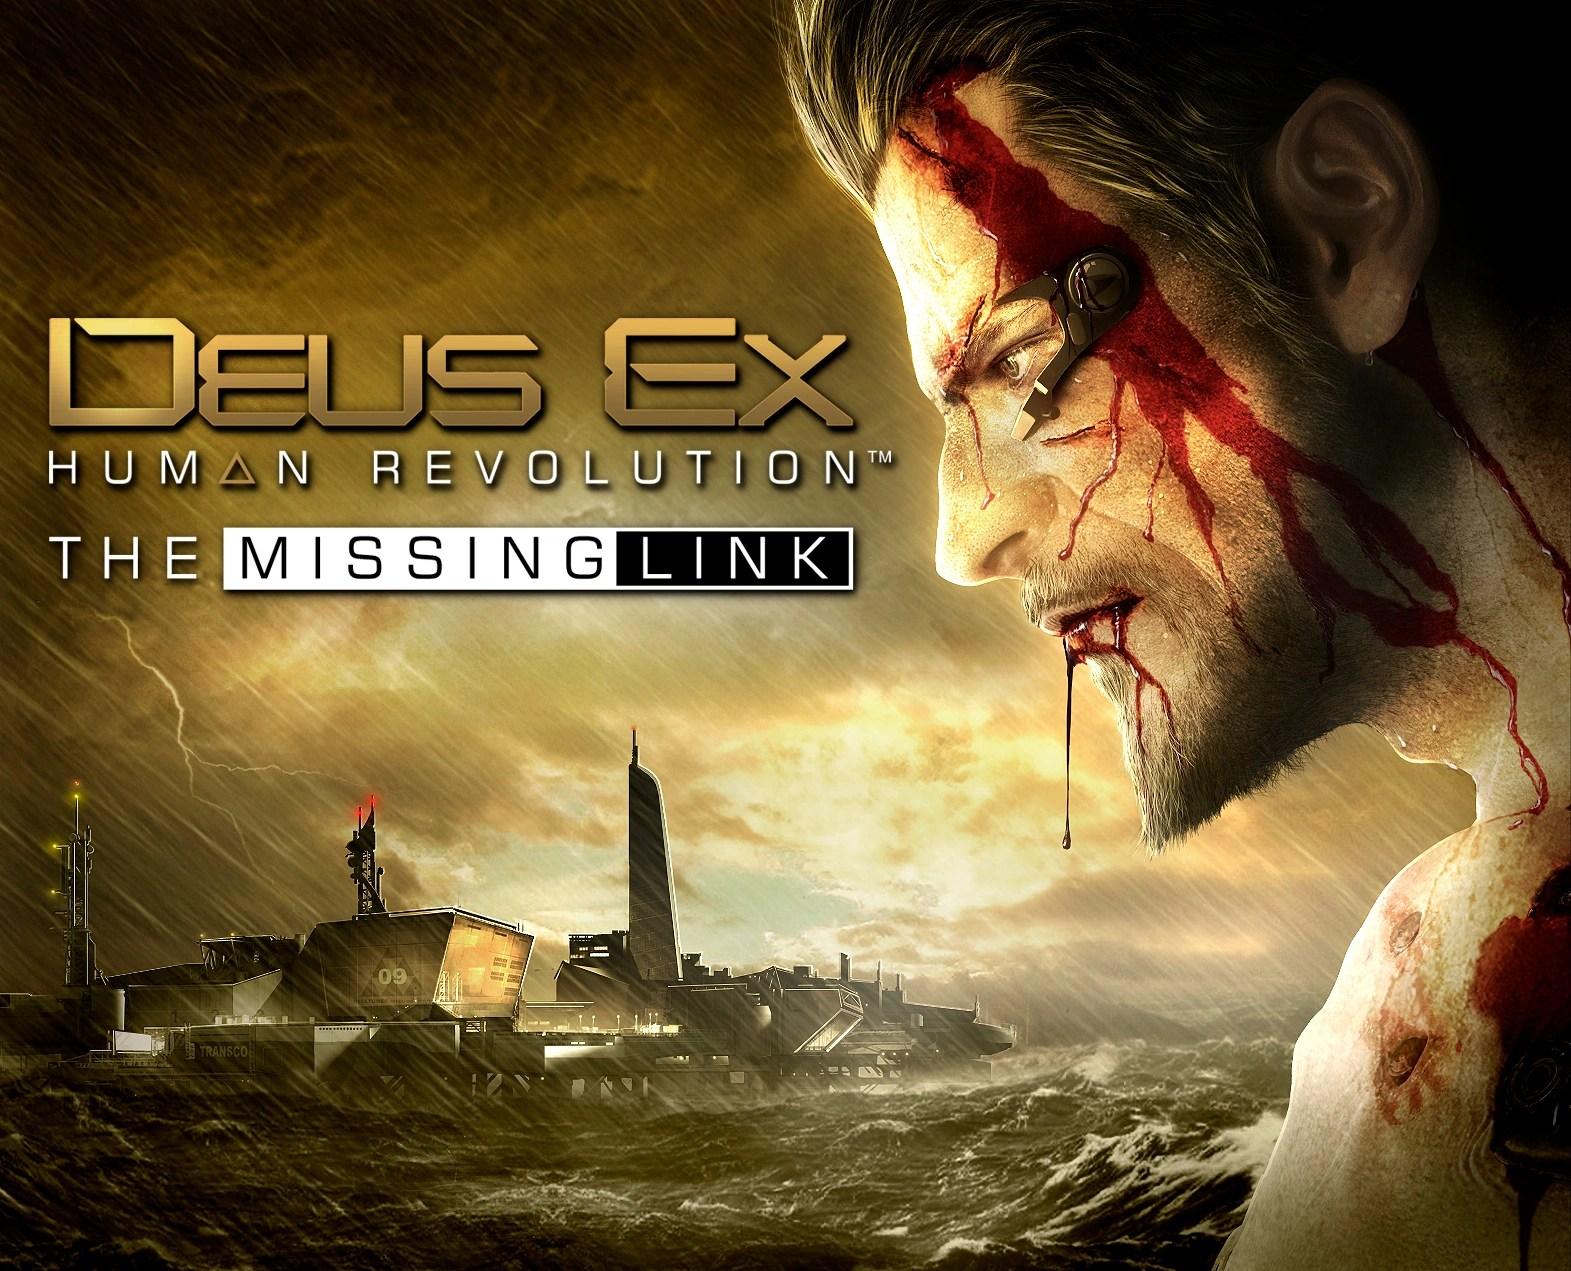 Easter Wallpaper Hd The Missing Link Deus Ex Wiki